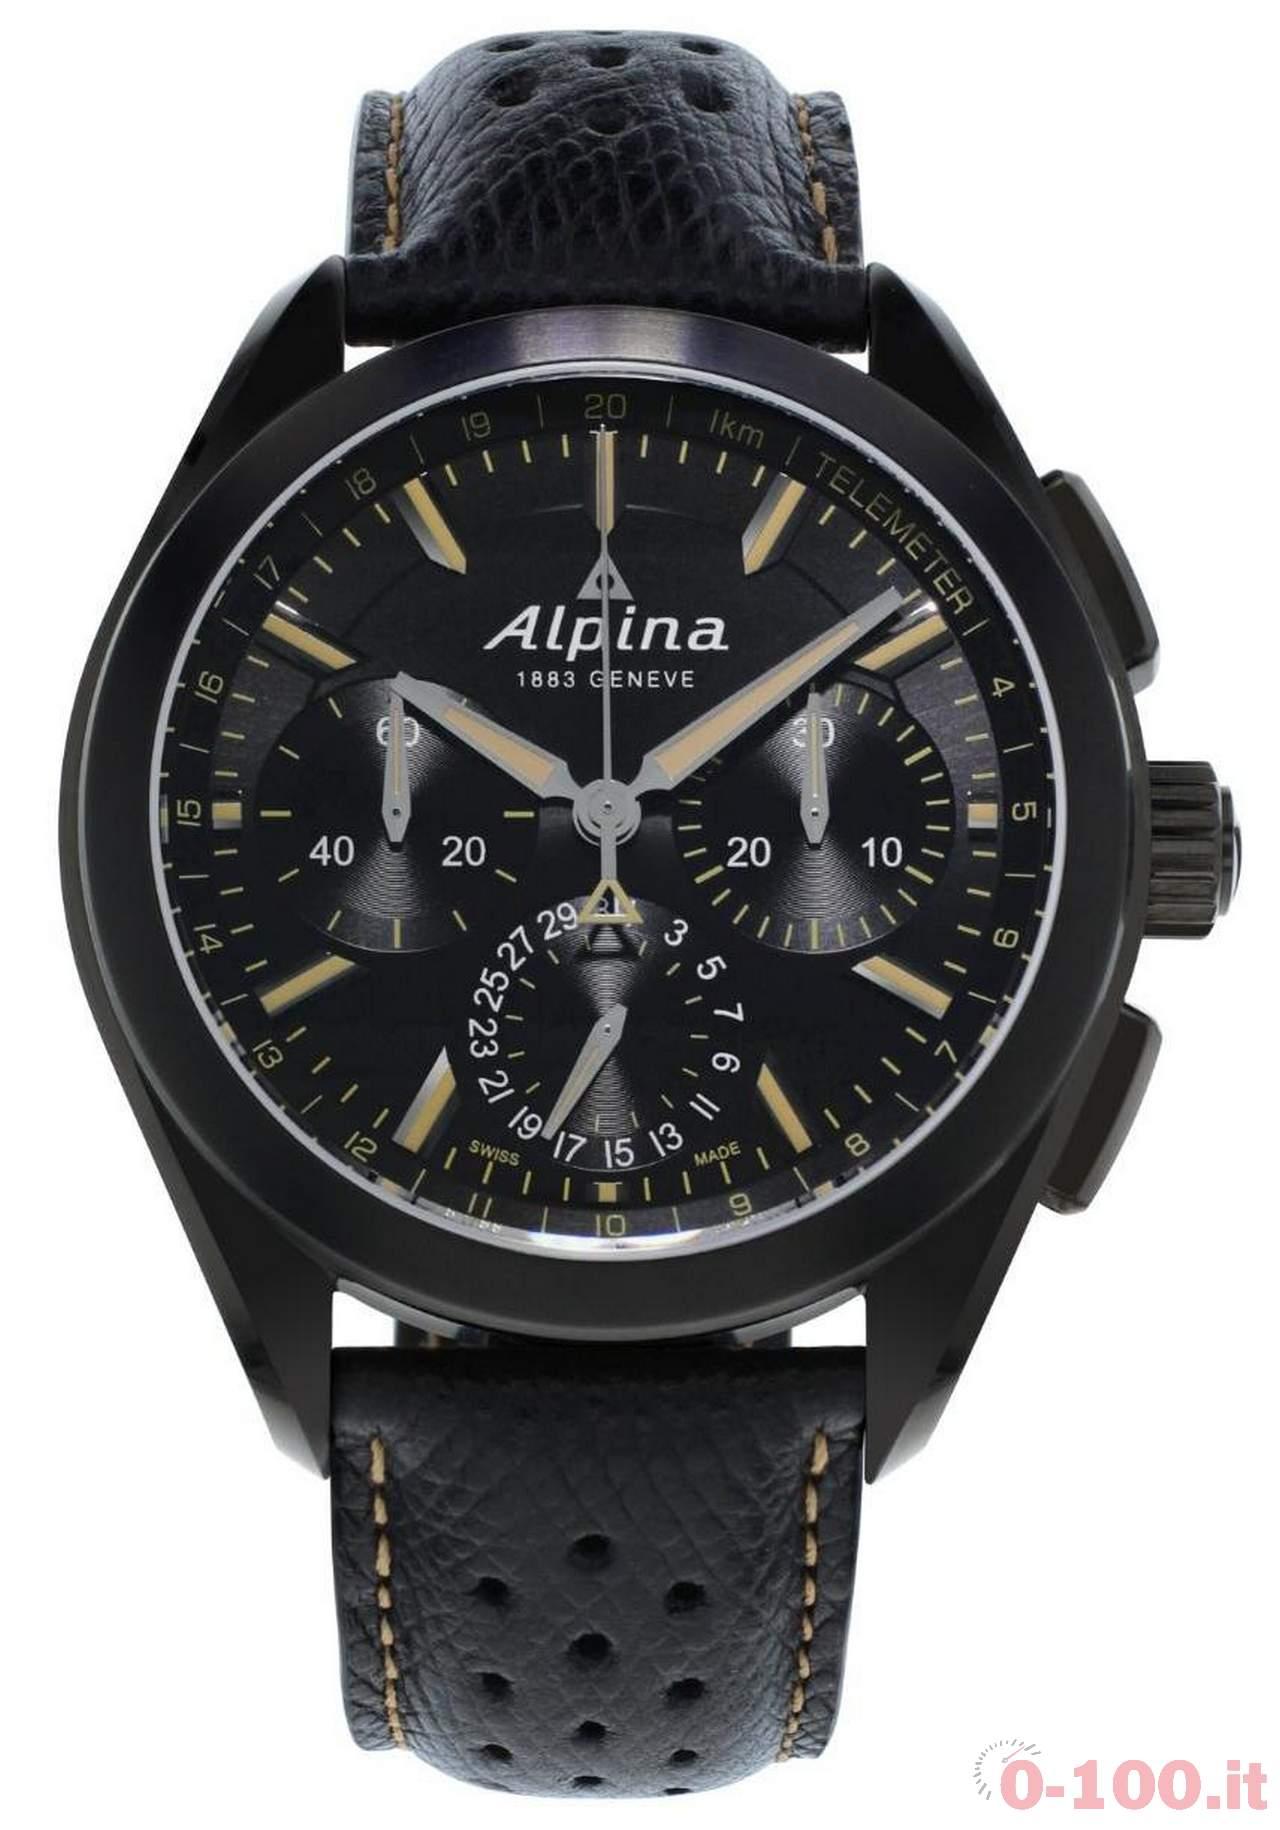 anteprima-baselworld-2016-alpiner-4-manufacture-flyback-chronograph-prezzo-price_0-1002